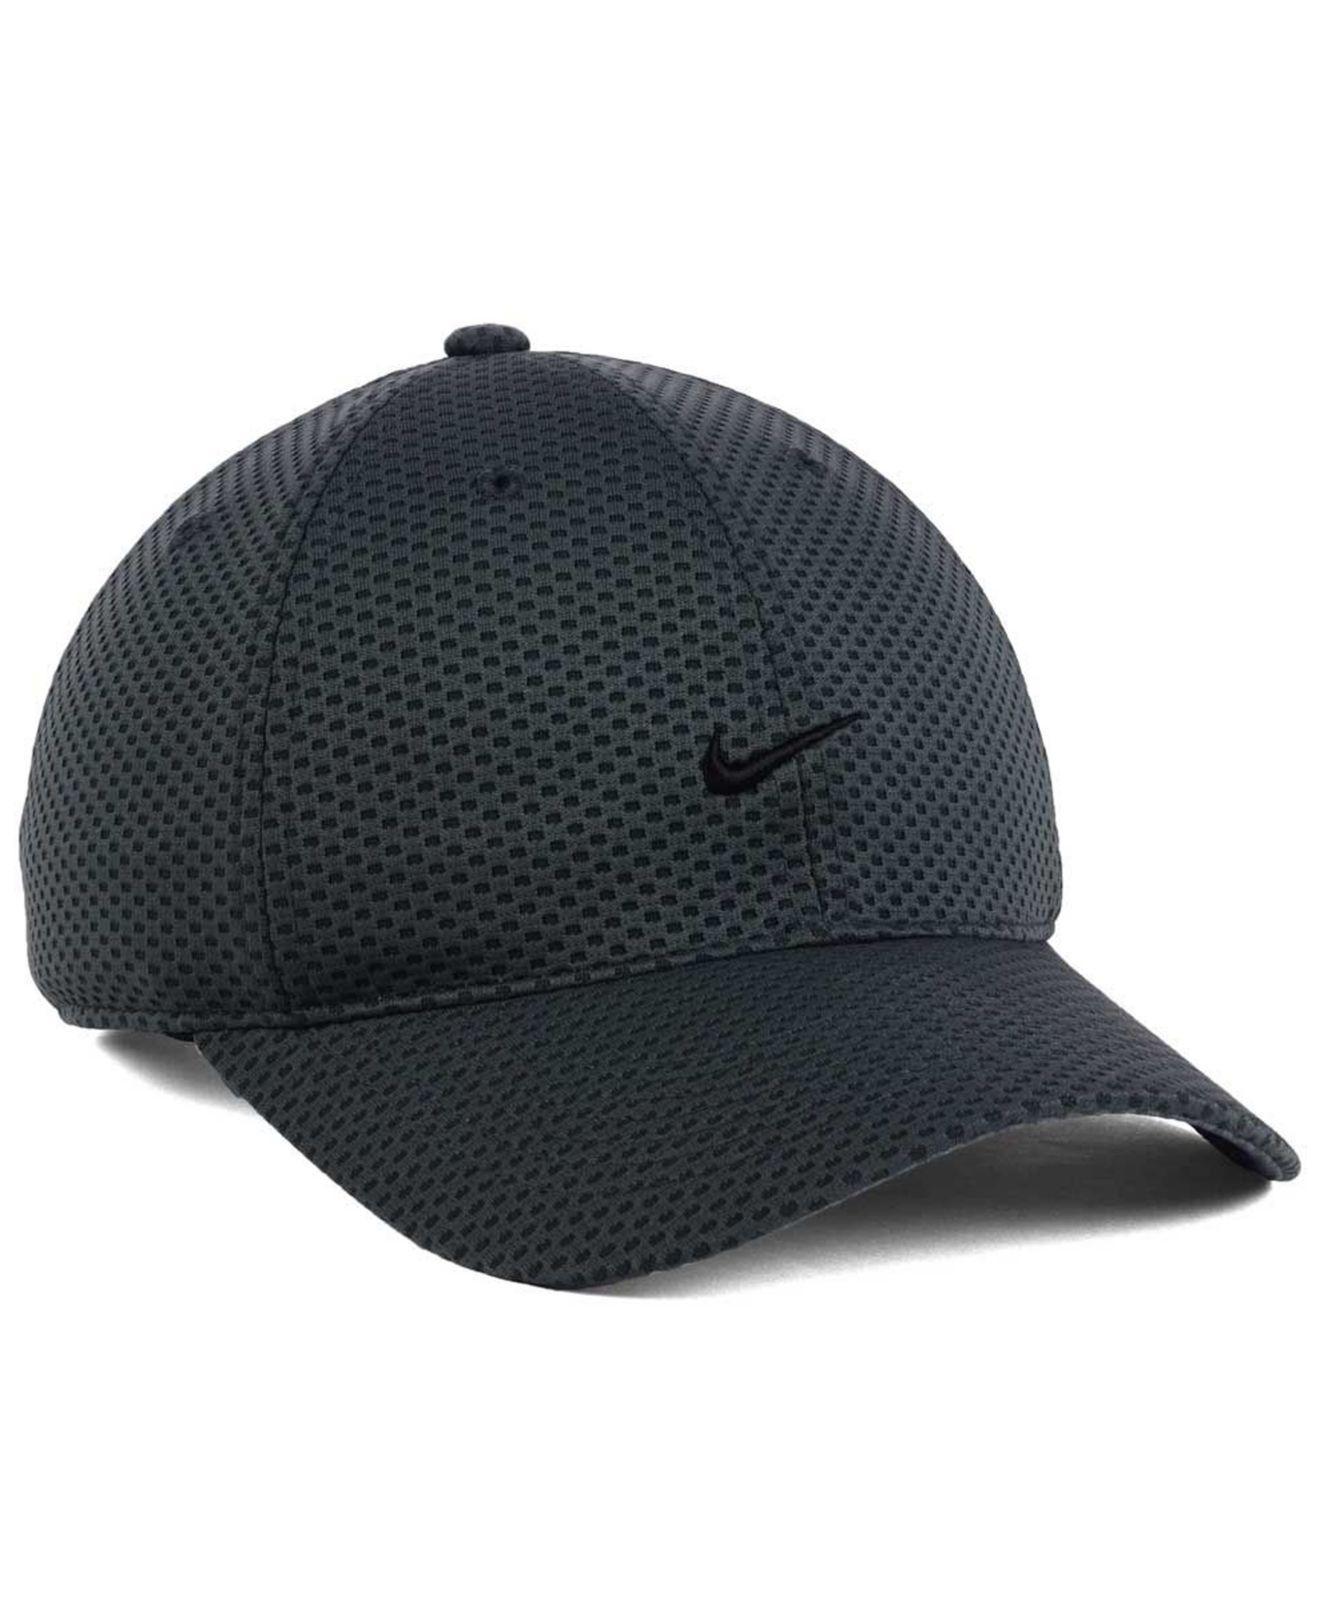 8088ad4b ... buy lyst nike 6 panel tailwind cap in black for men 62dac cd3a8